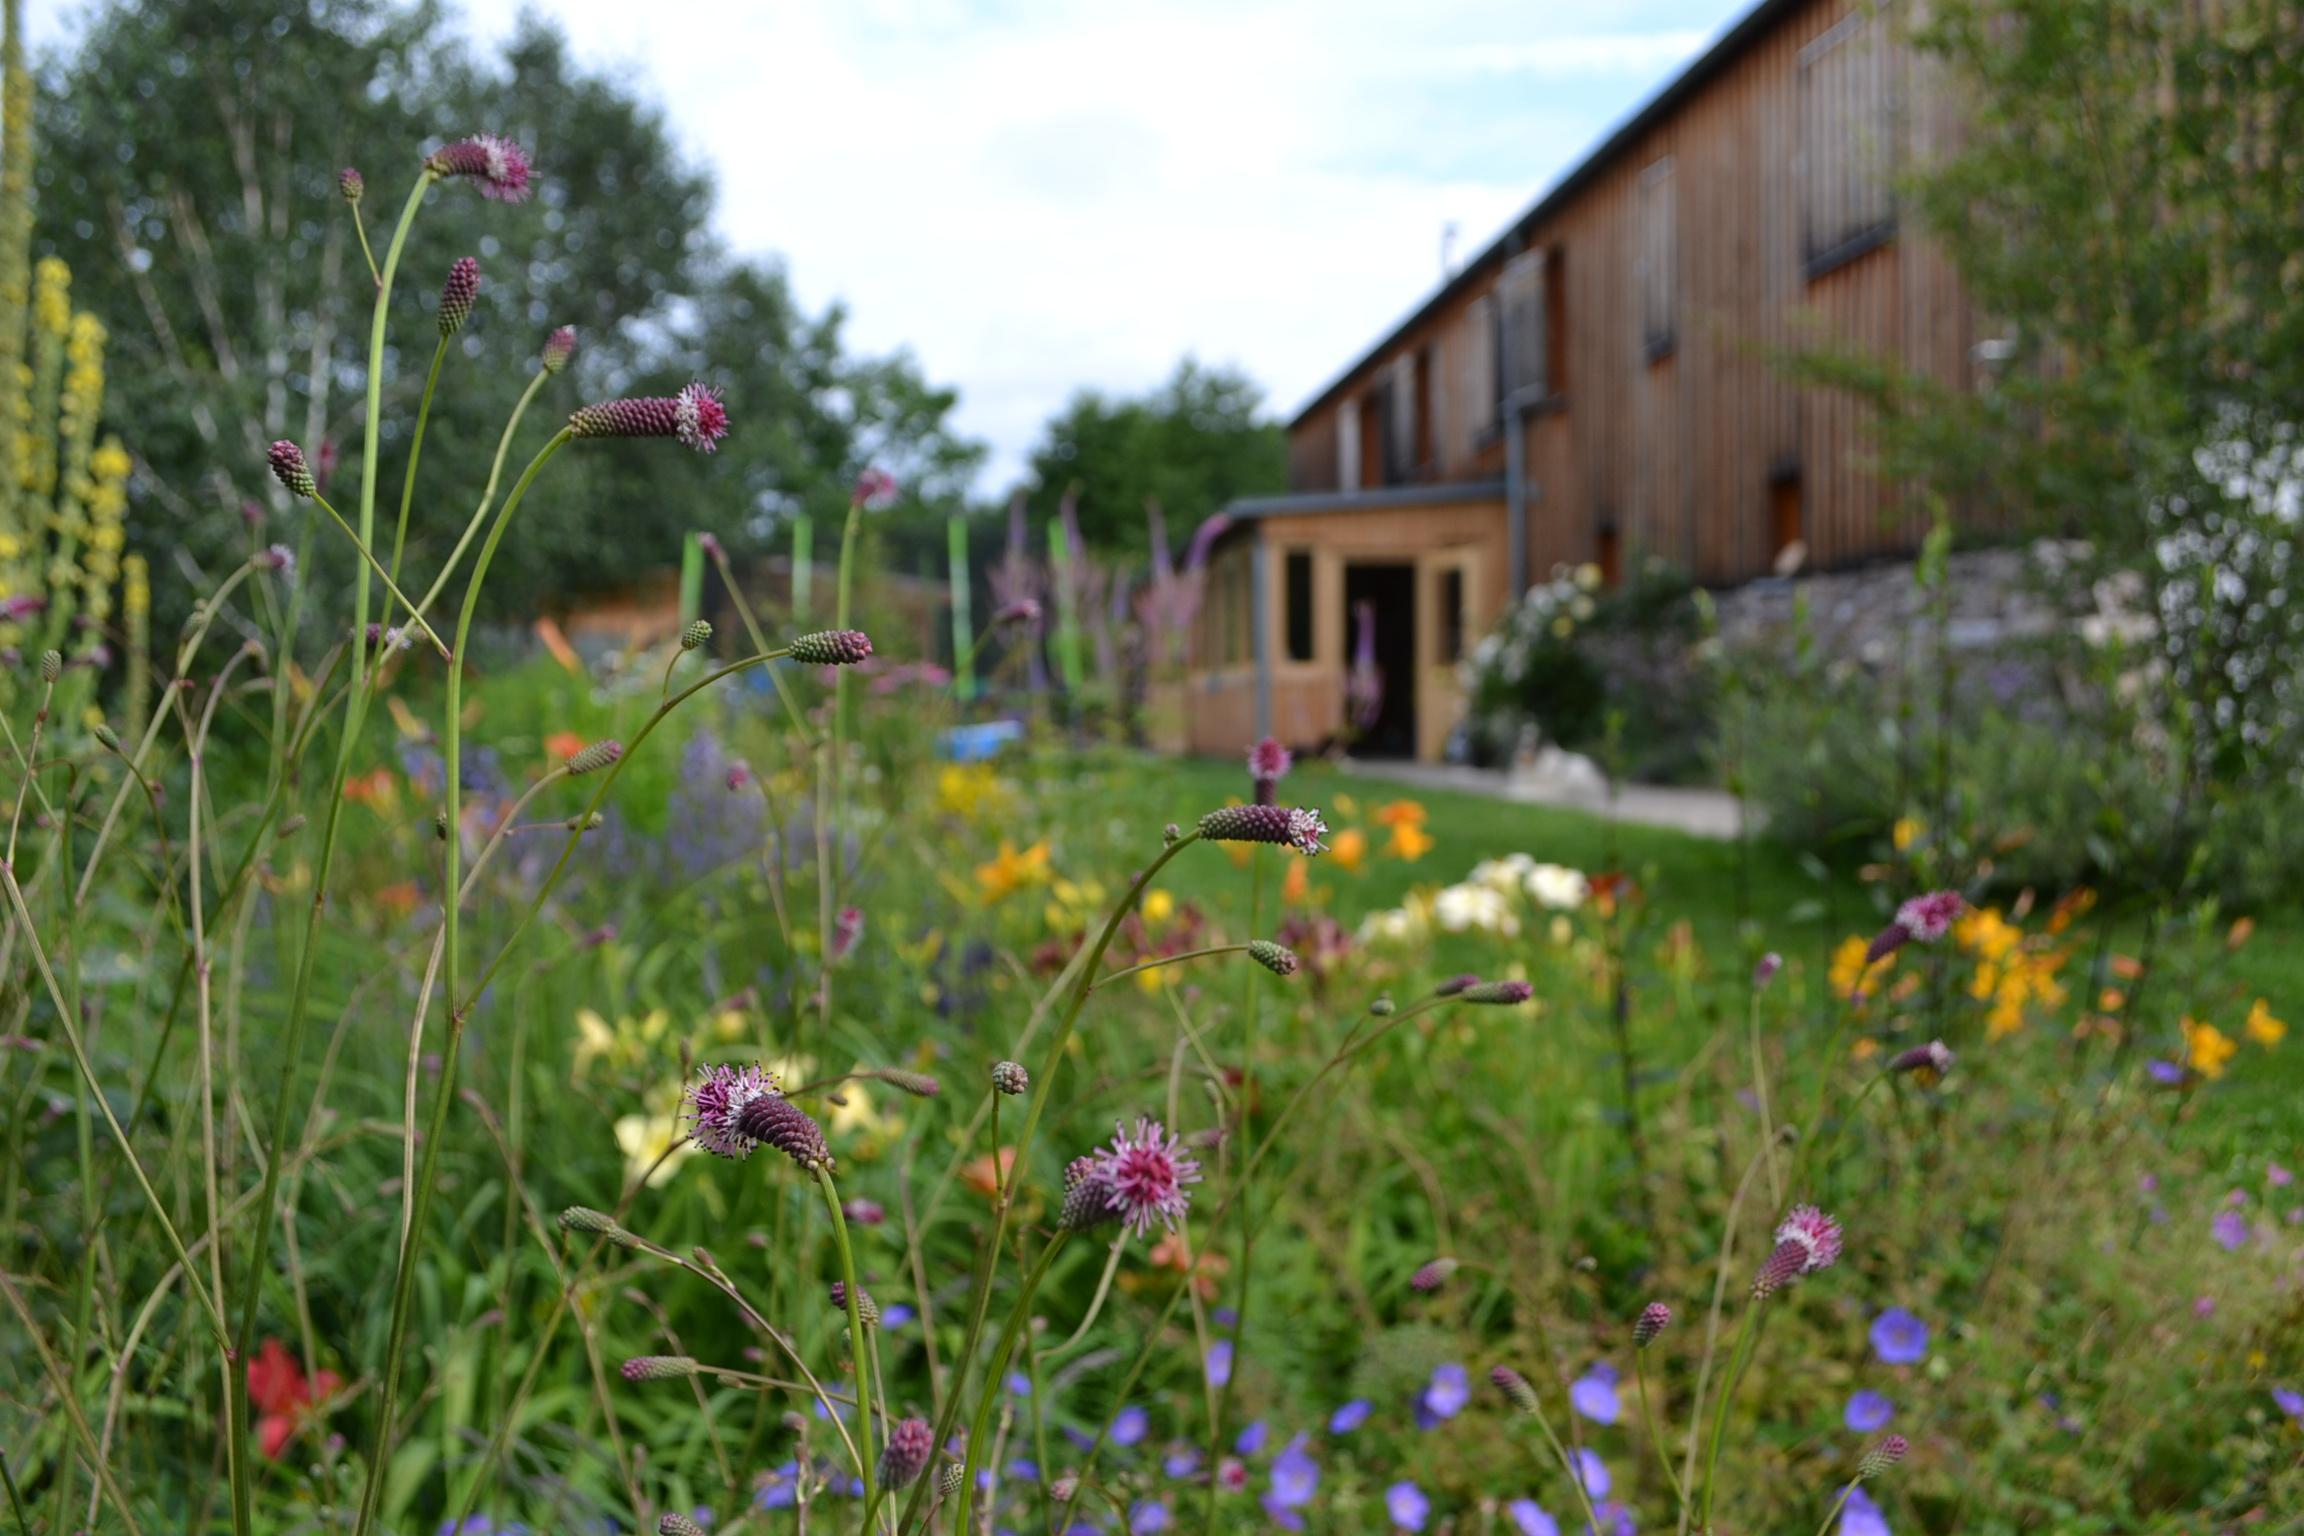 Zahrady - Zahrada je cesta